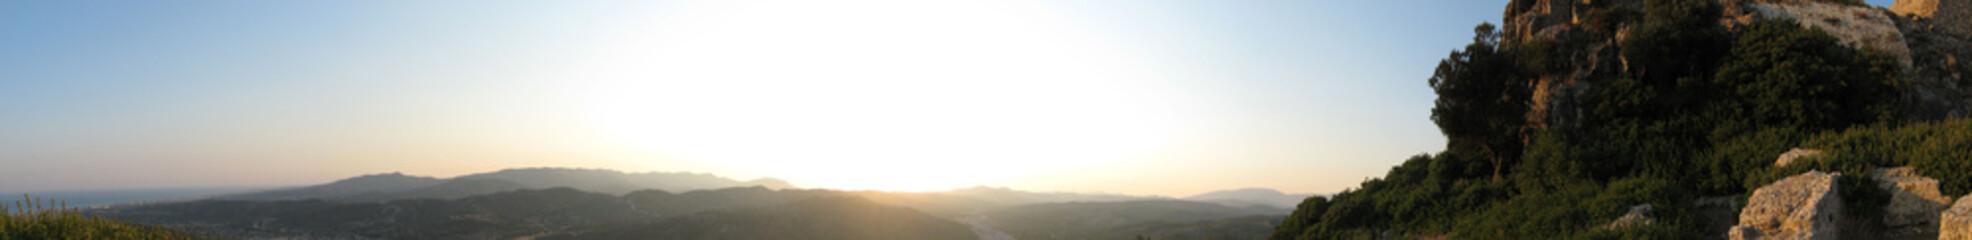 Greece Landscape Rhodes